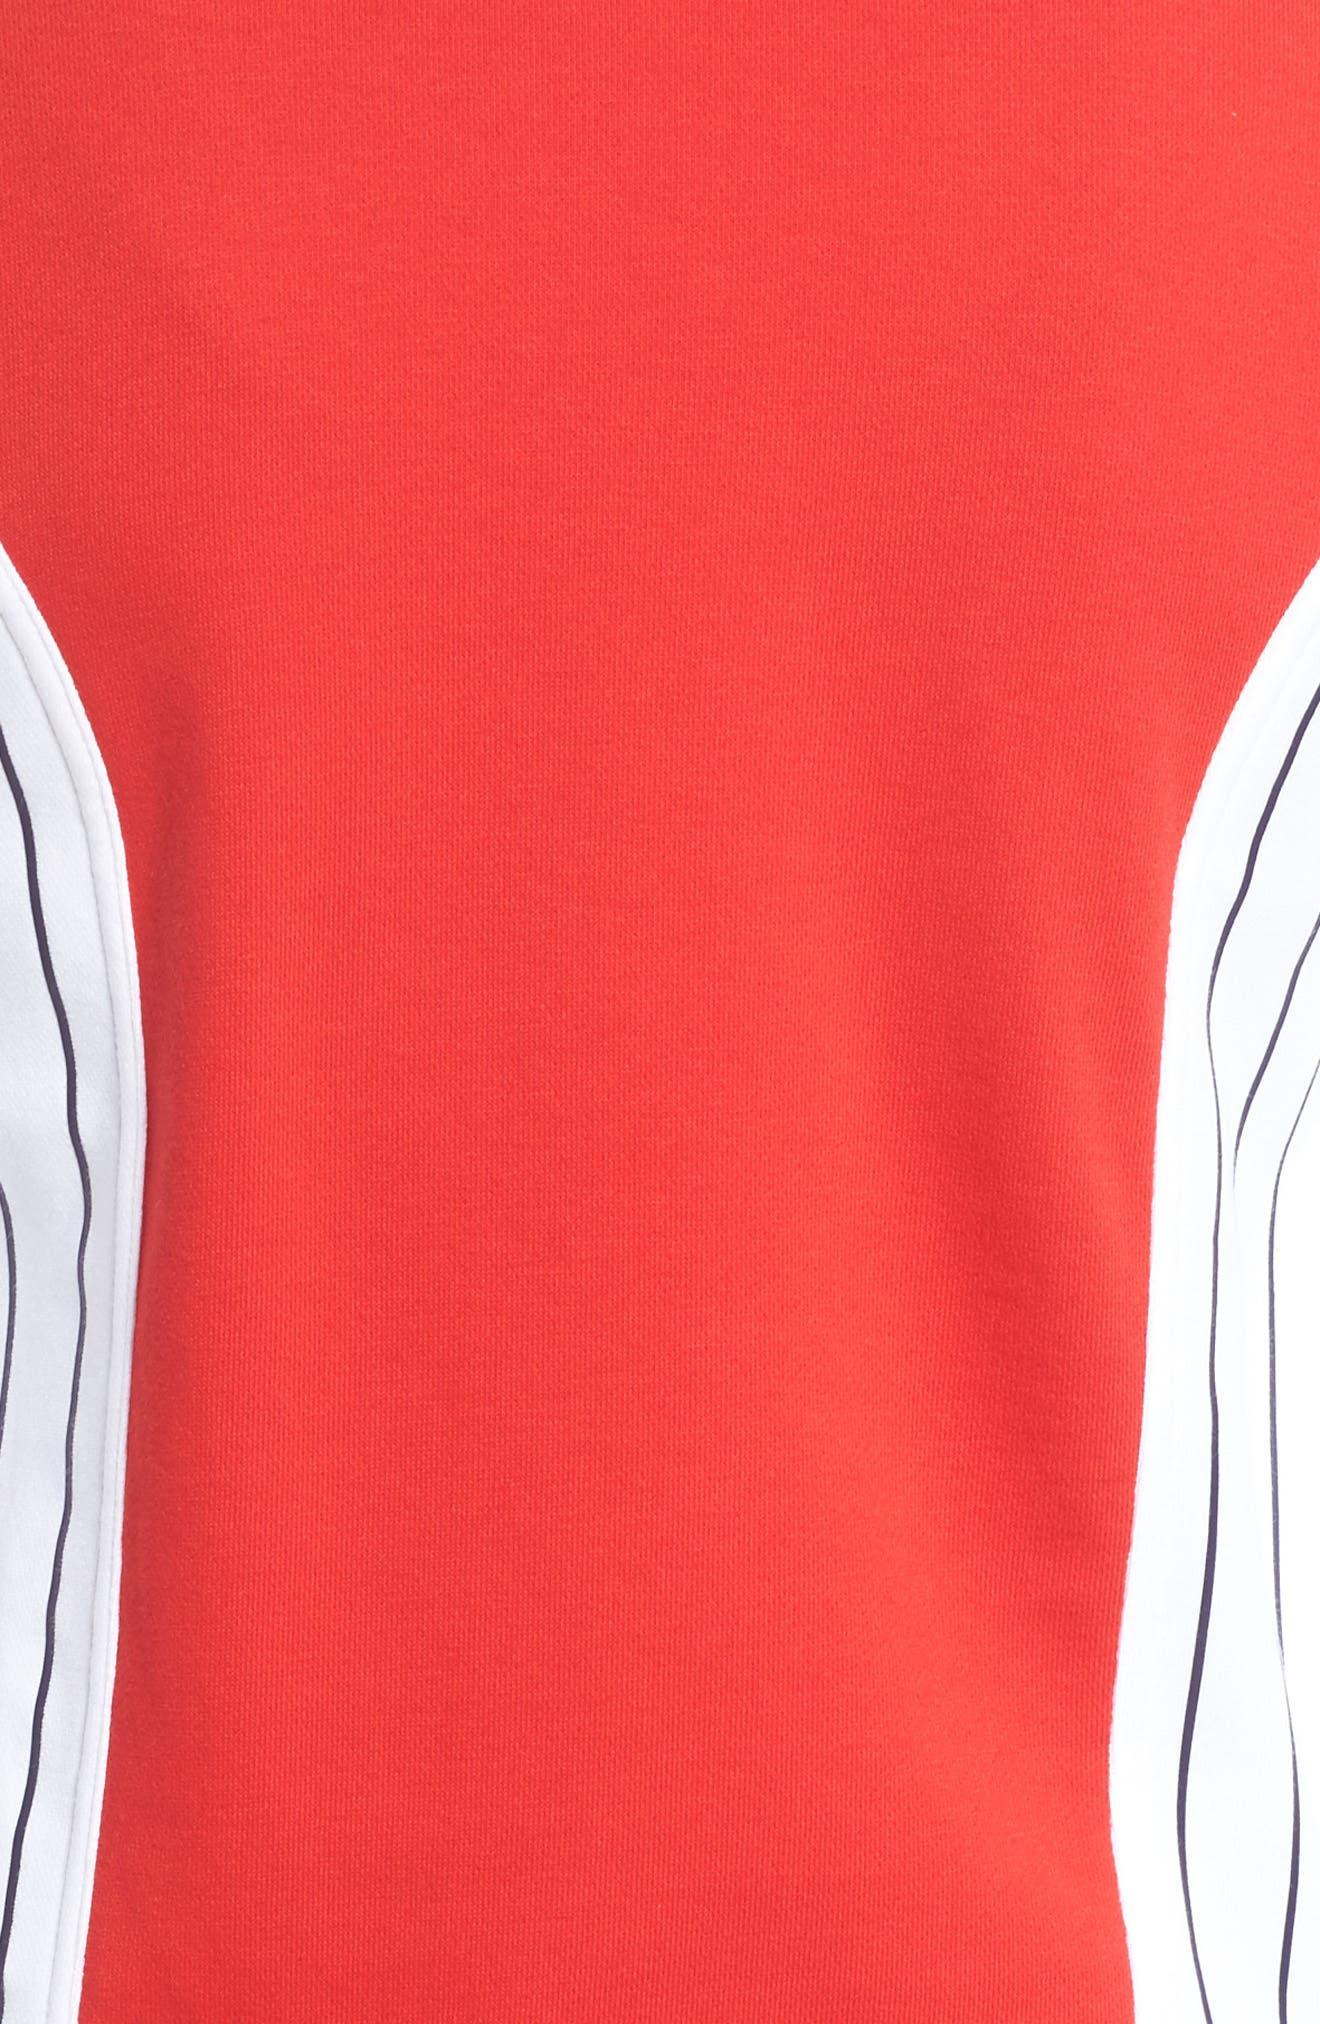 Settanta II Jacket,                             Alternate thumbnail 6, color,                             Chinese Red/ White/ Navy